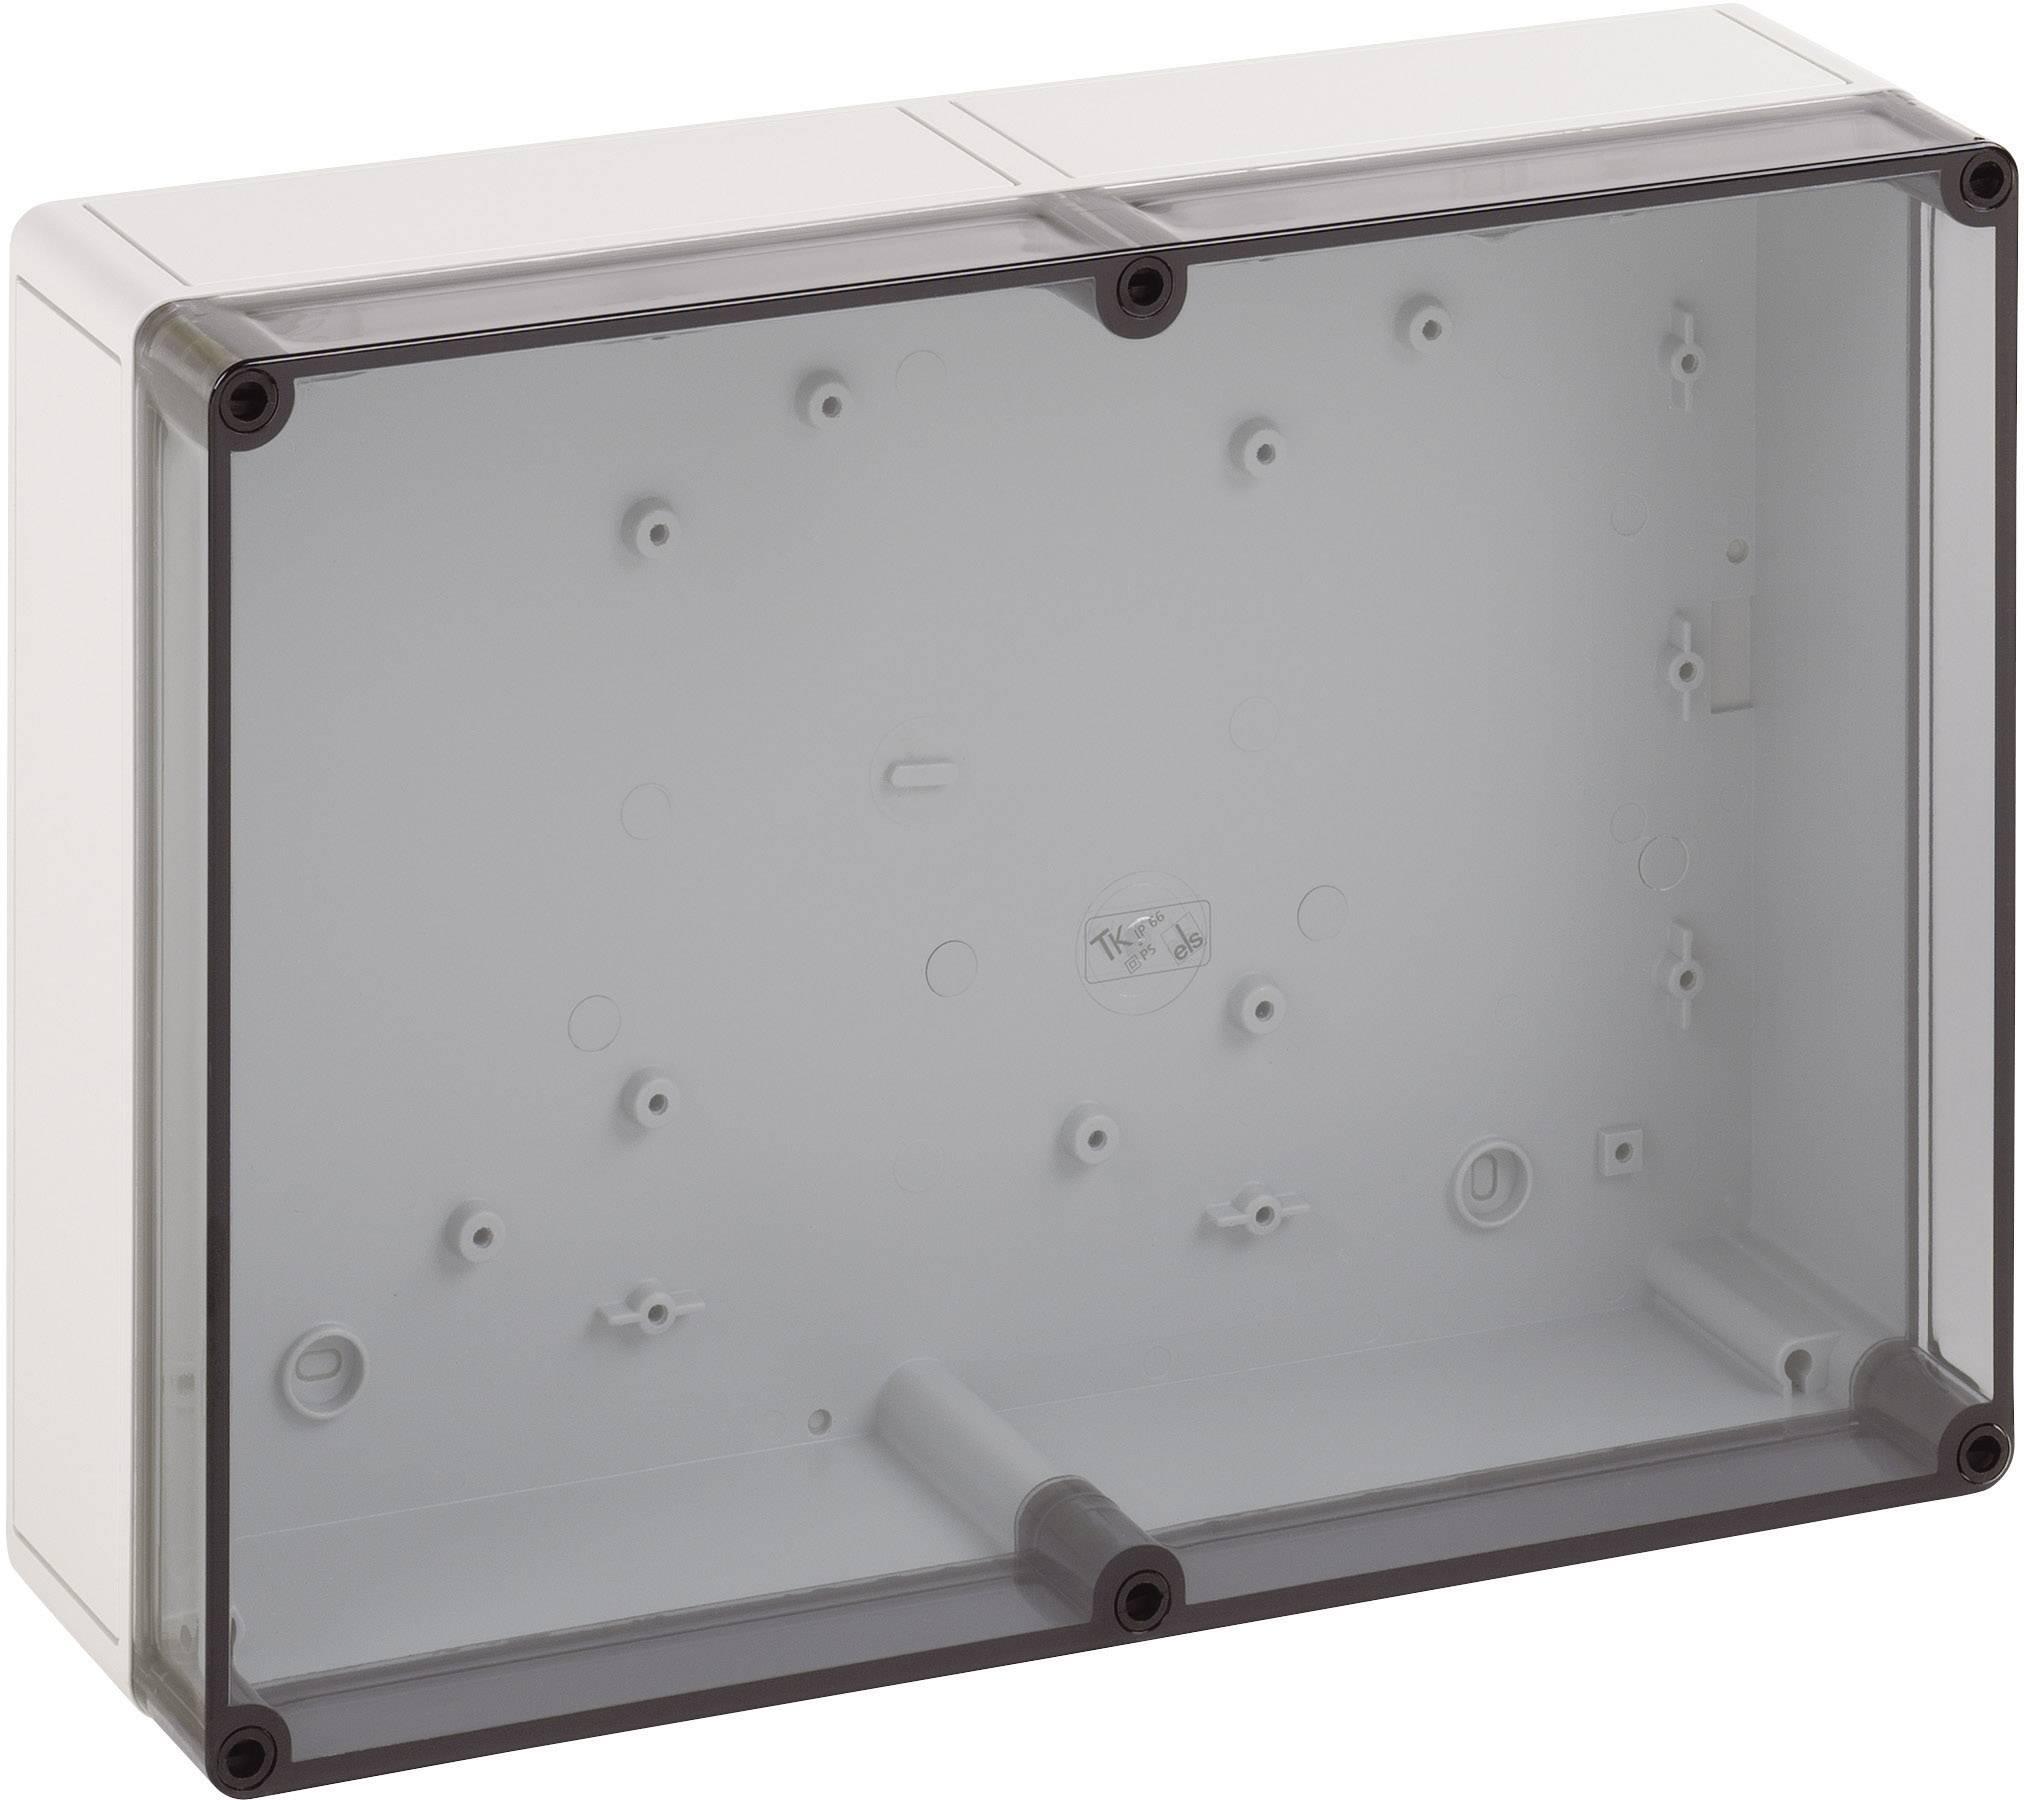 Instalační krabička Spelsberg TK PS 1309-6-t, (d x š x v) 130 x 94 x 57 mm, polykarbonát, polystyren, šedá, 1 ks